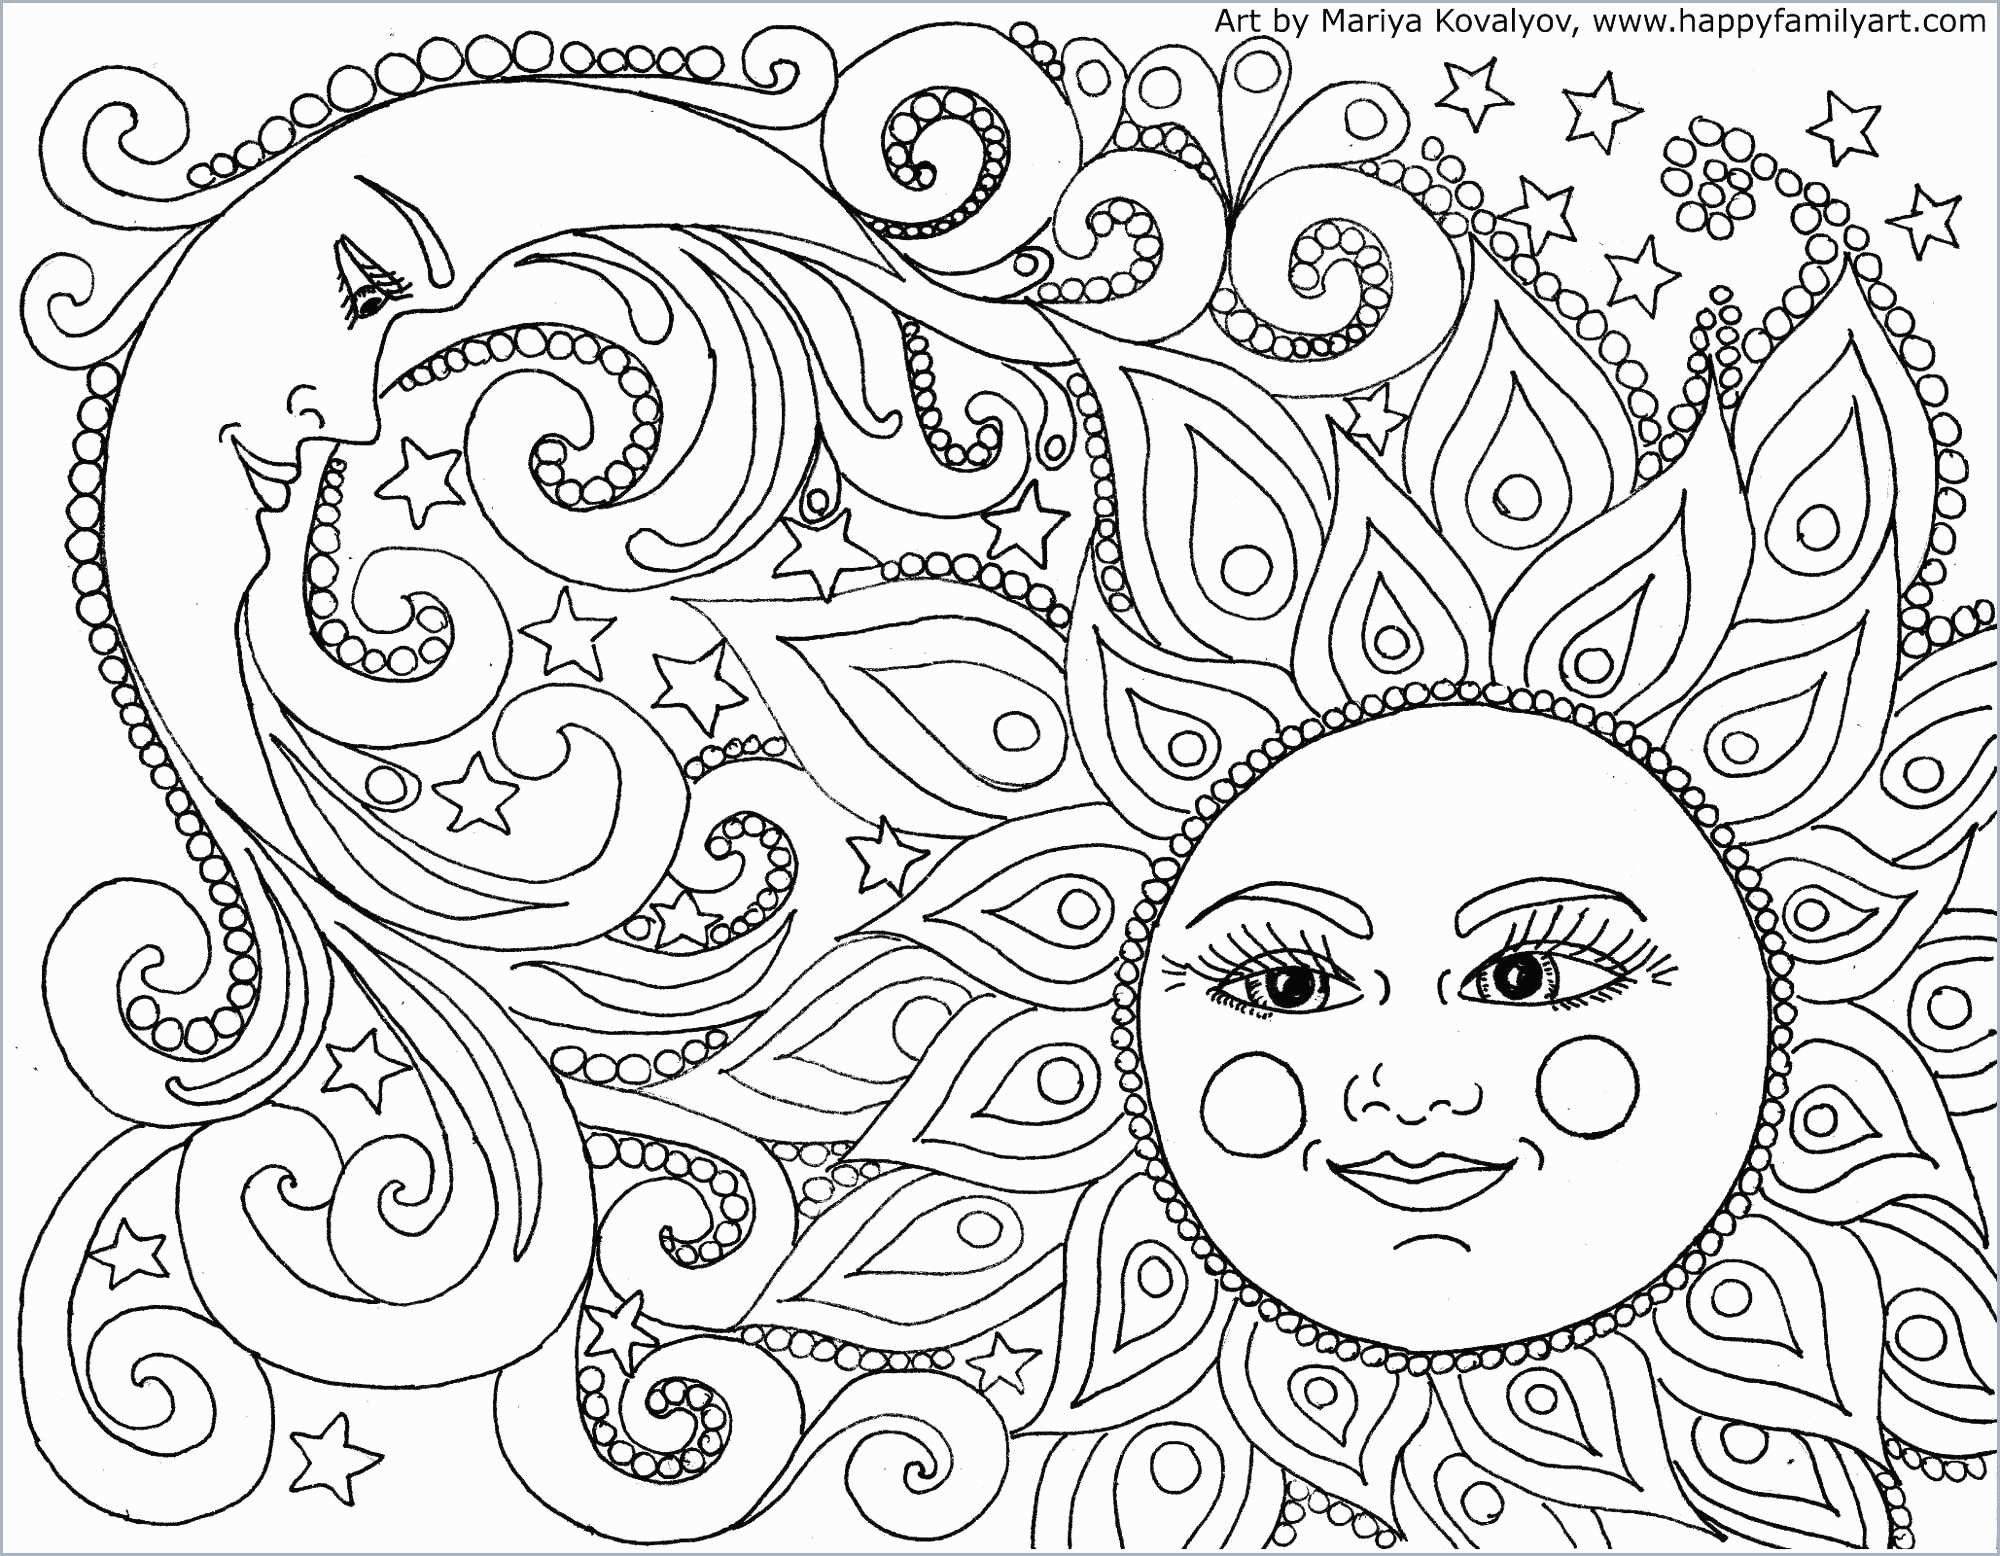 Ausmalbilder Minions Baby Genial Minions Coloring Pages Great Minions Ausmalbilder Baby Elegant Happy Bilder